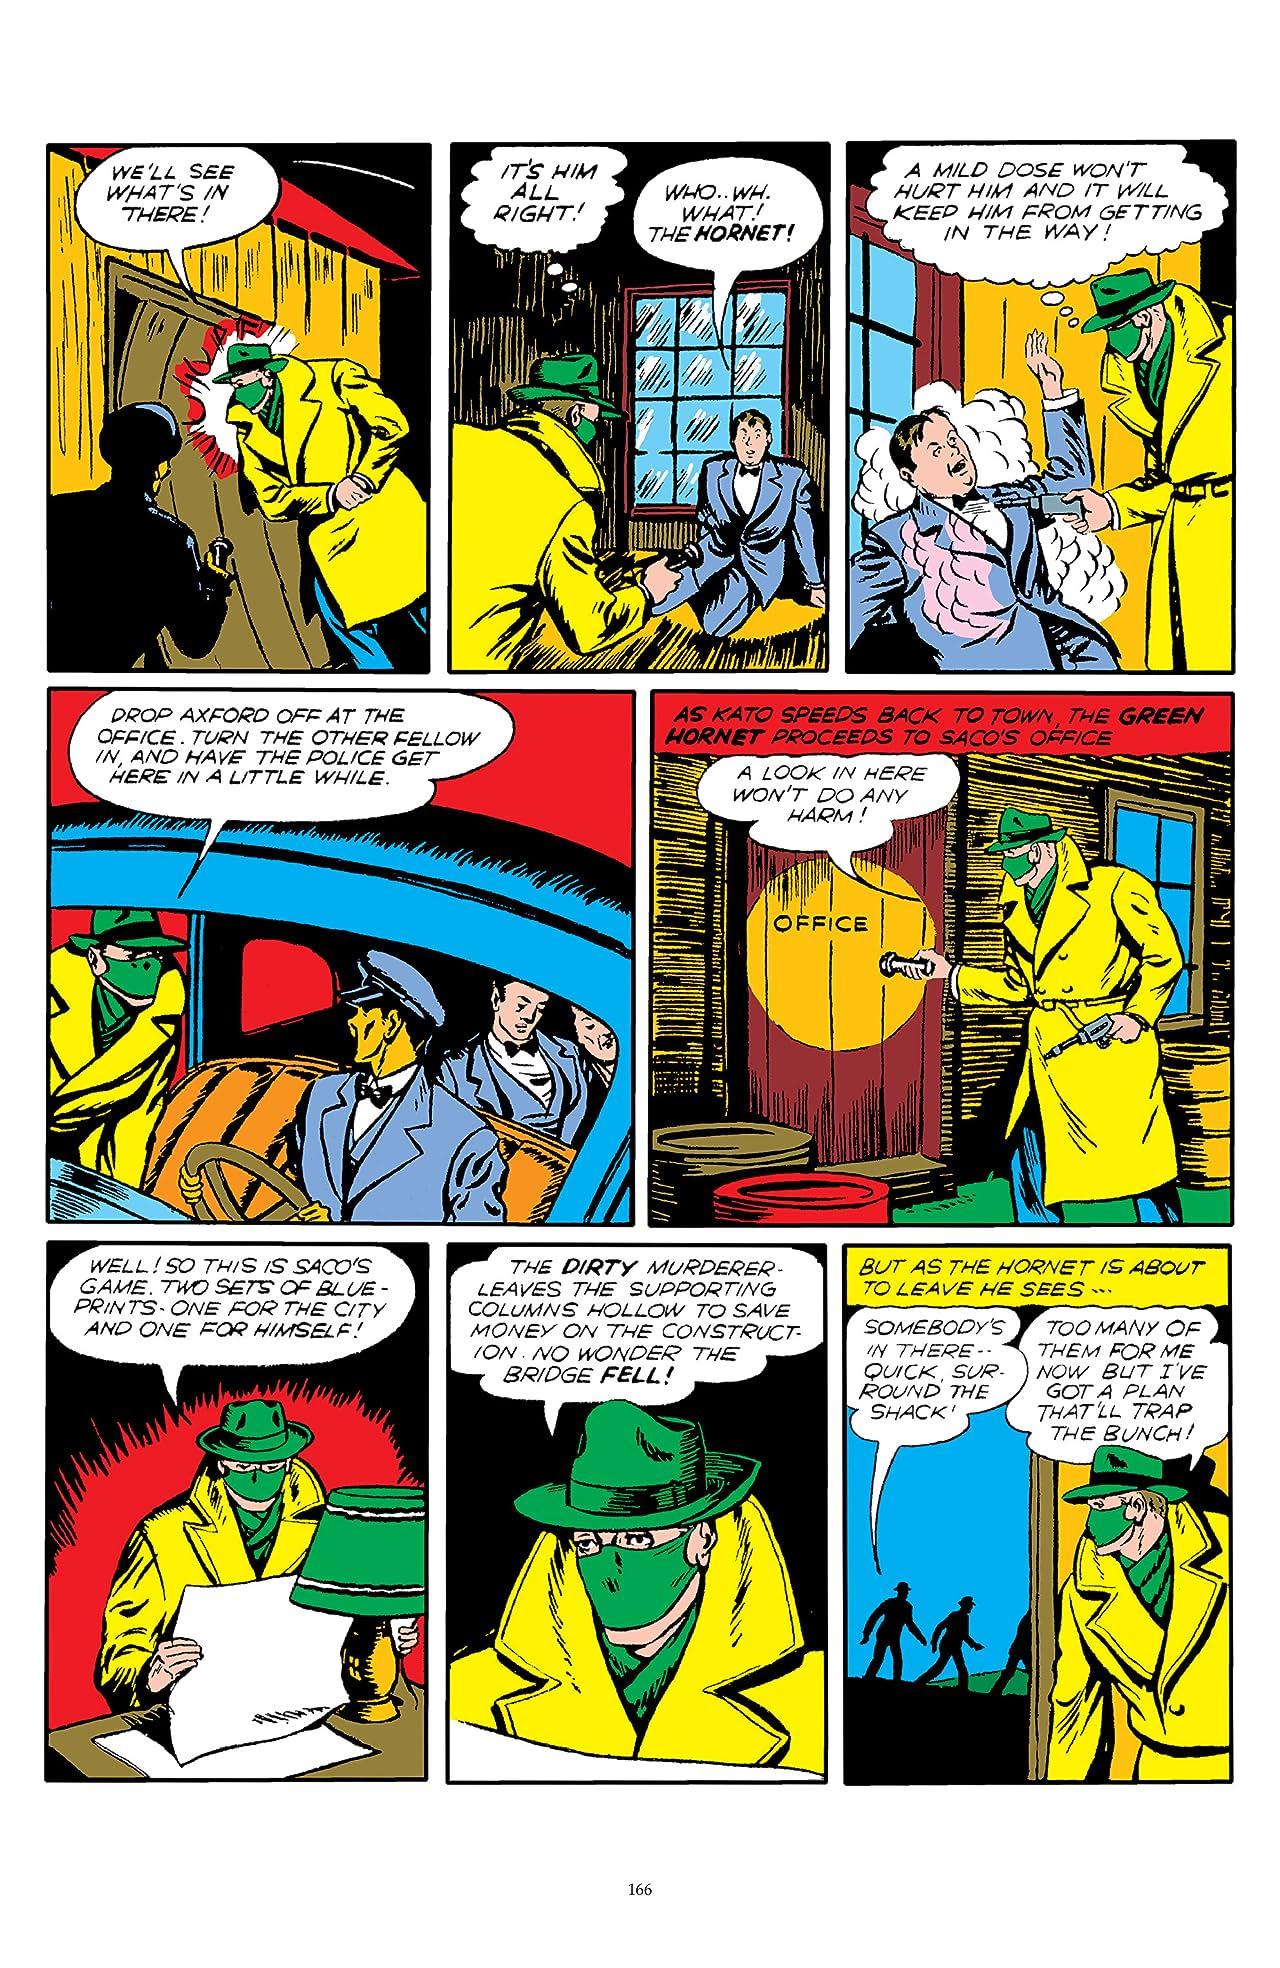 The Green Hornet: Golden Age Re-Mastered #4